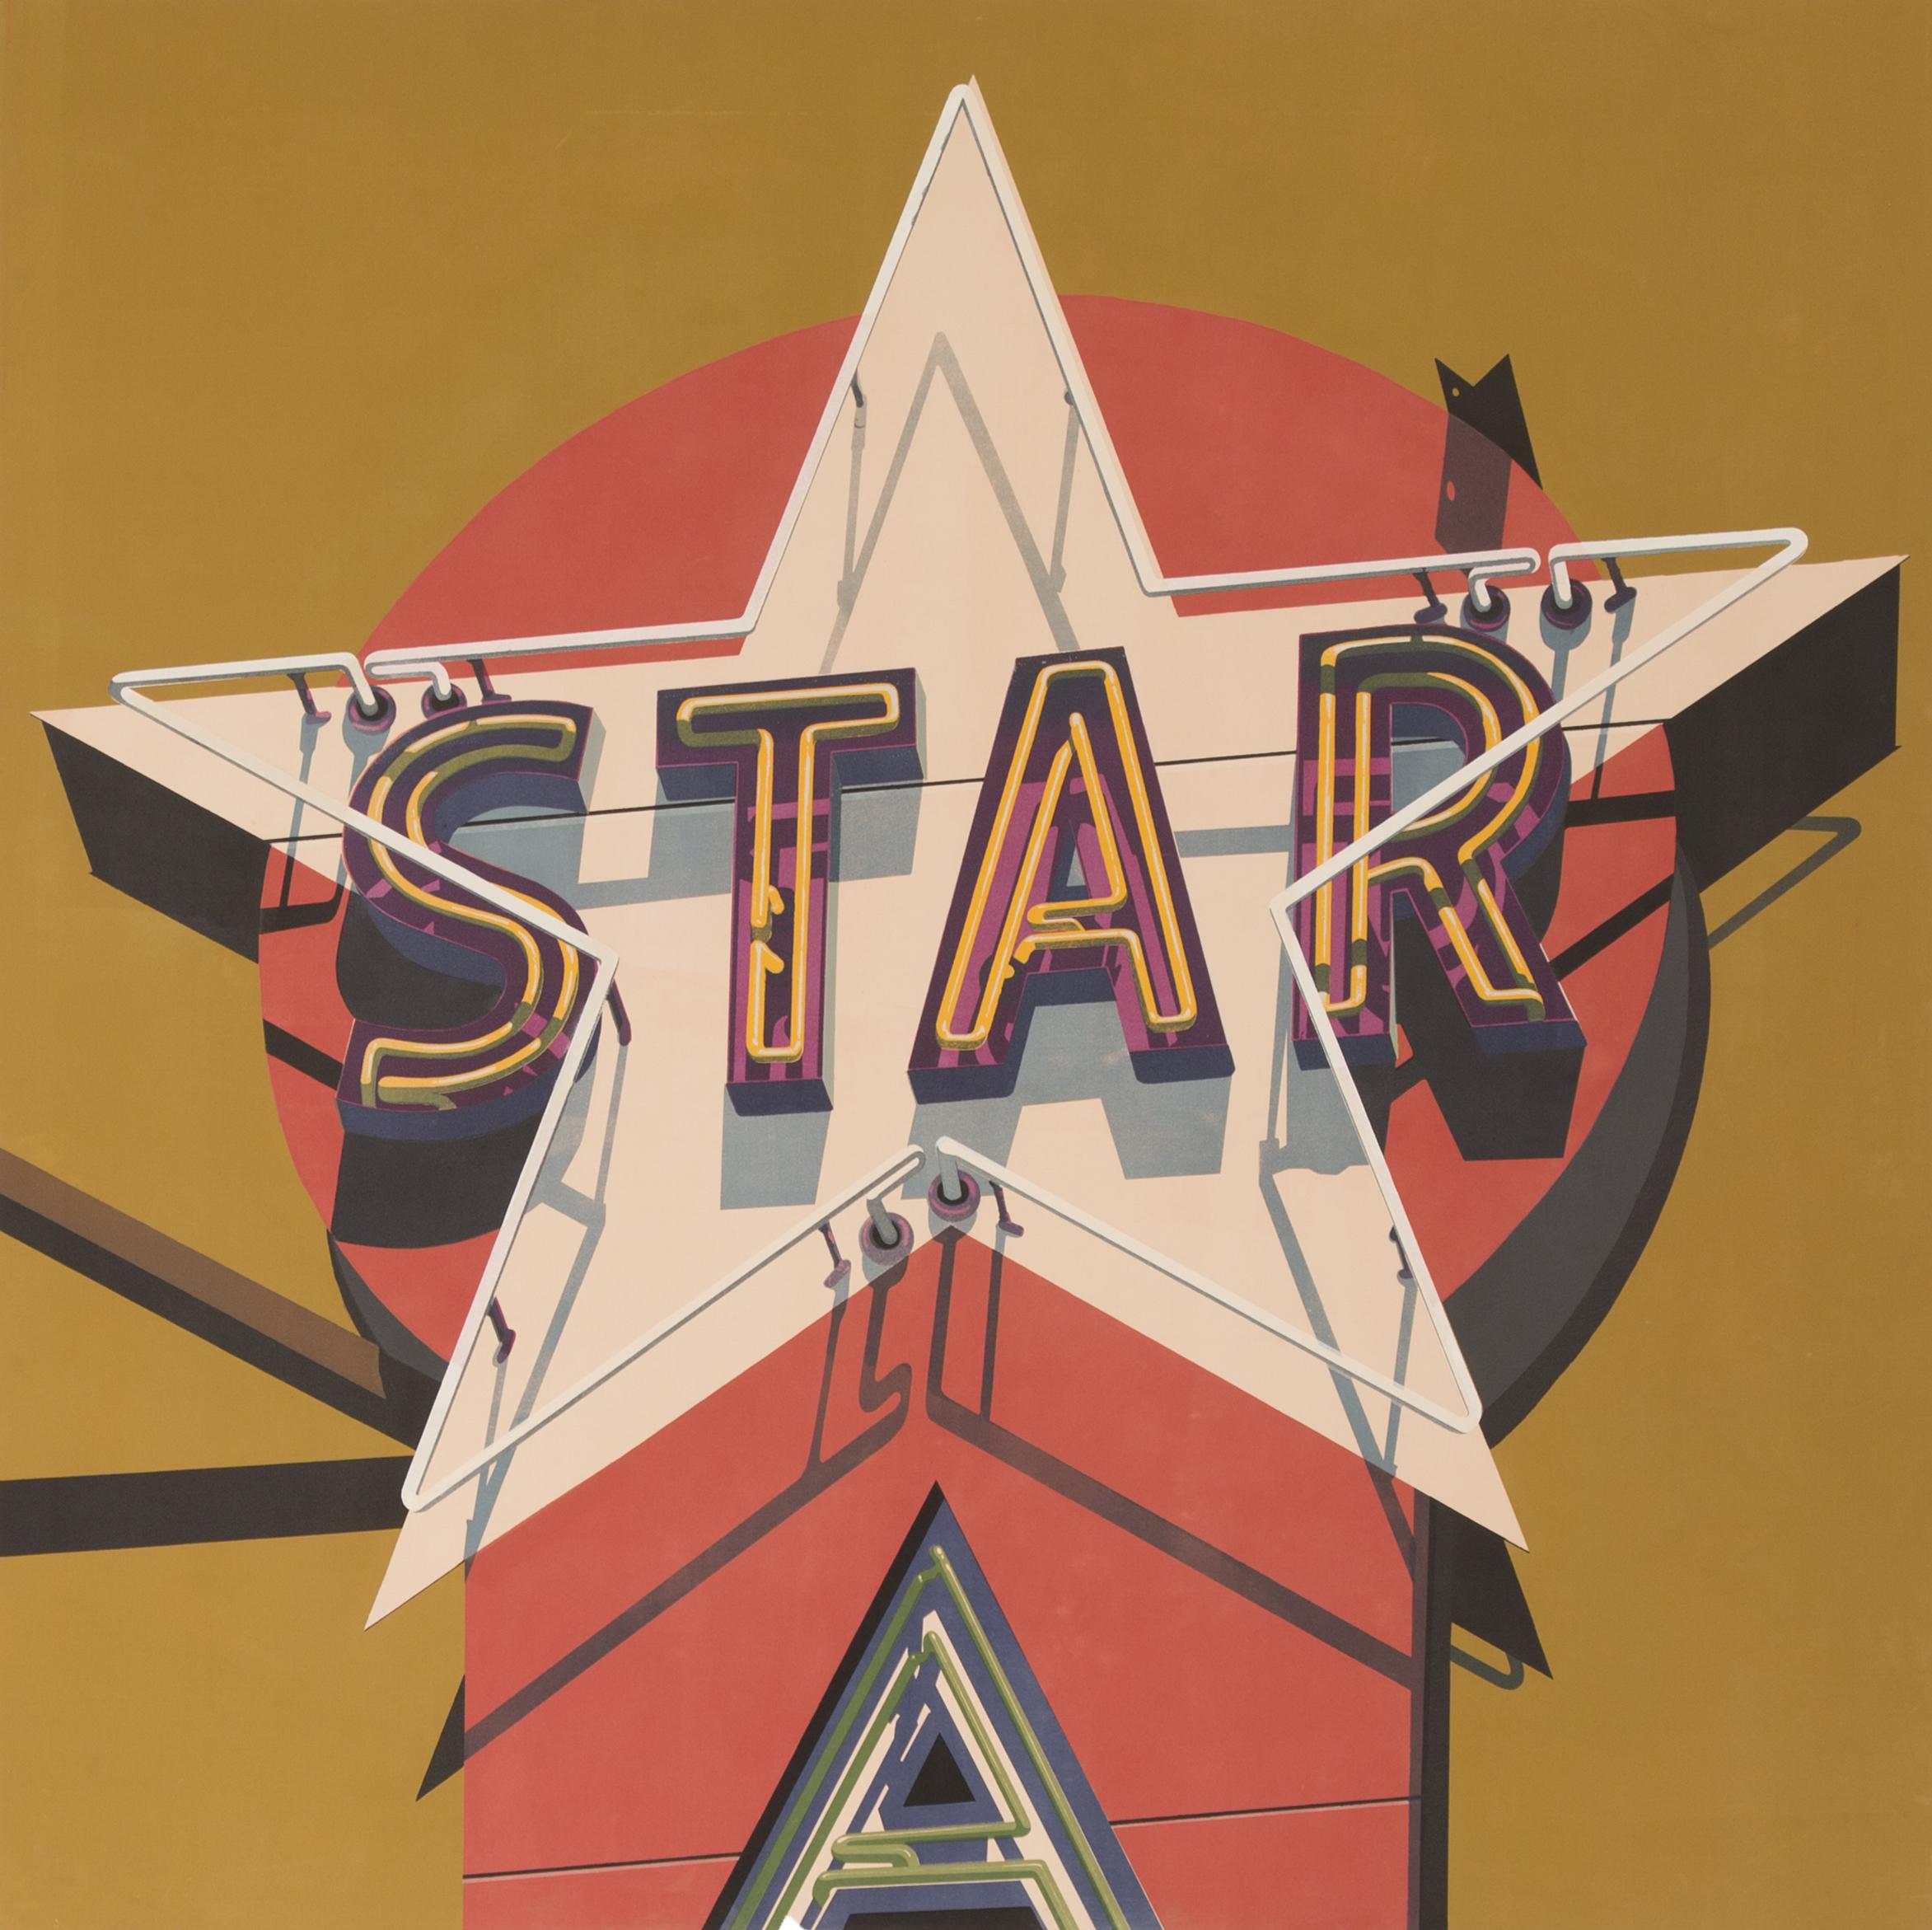 "Southern Star, 2009. Unique Silkscreen on Canvas. 79"" x 79""."